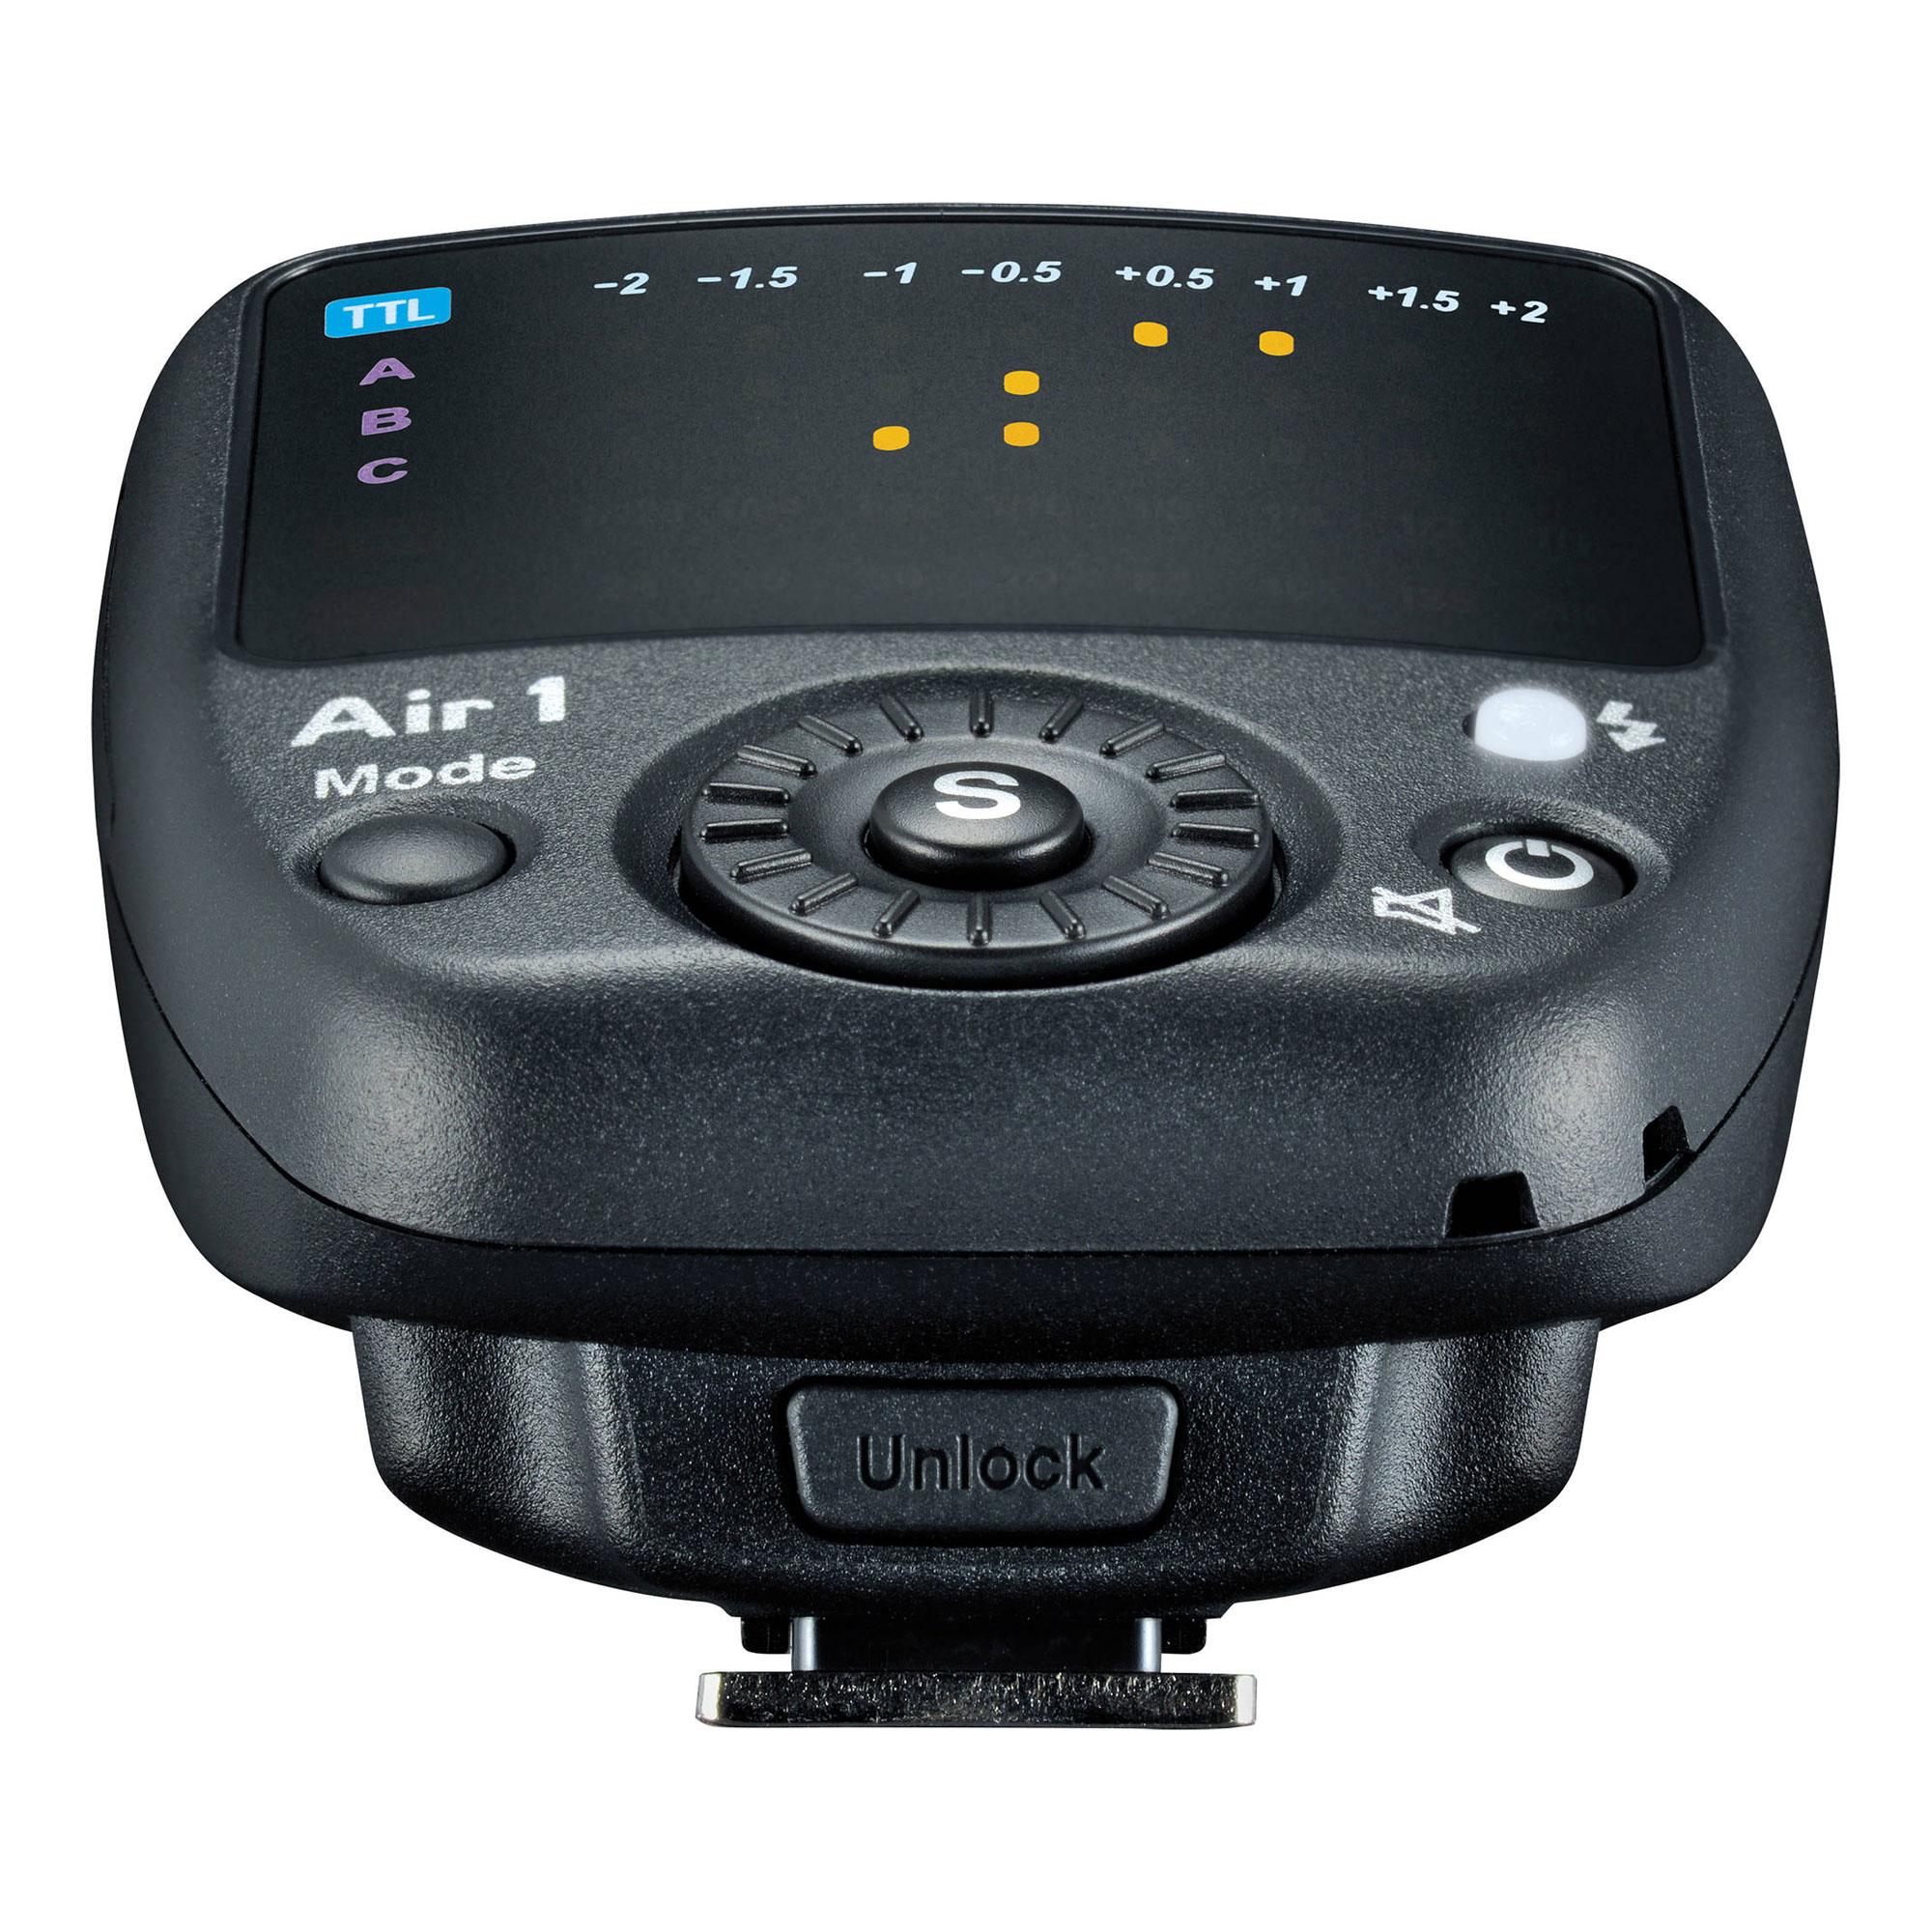 Air 1 Commander for Nikon Cameras